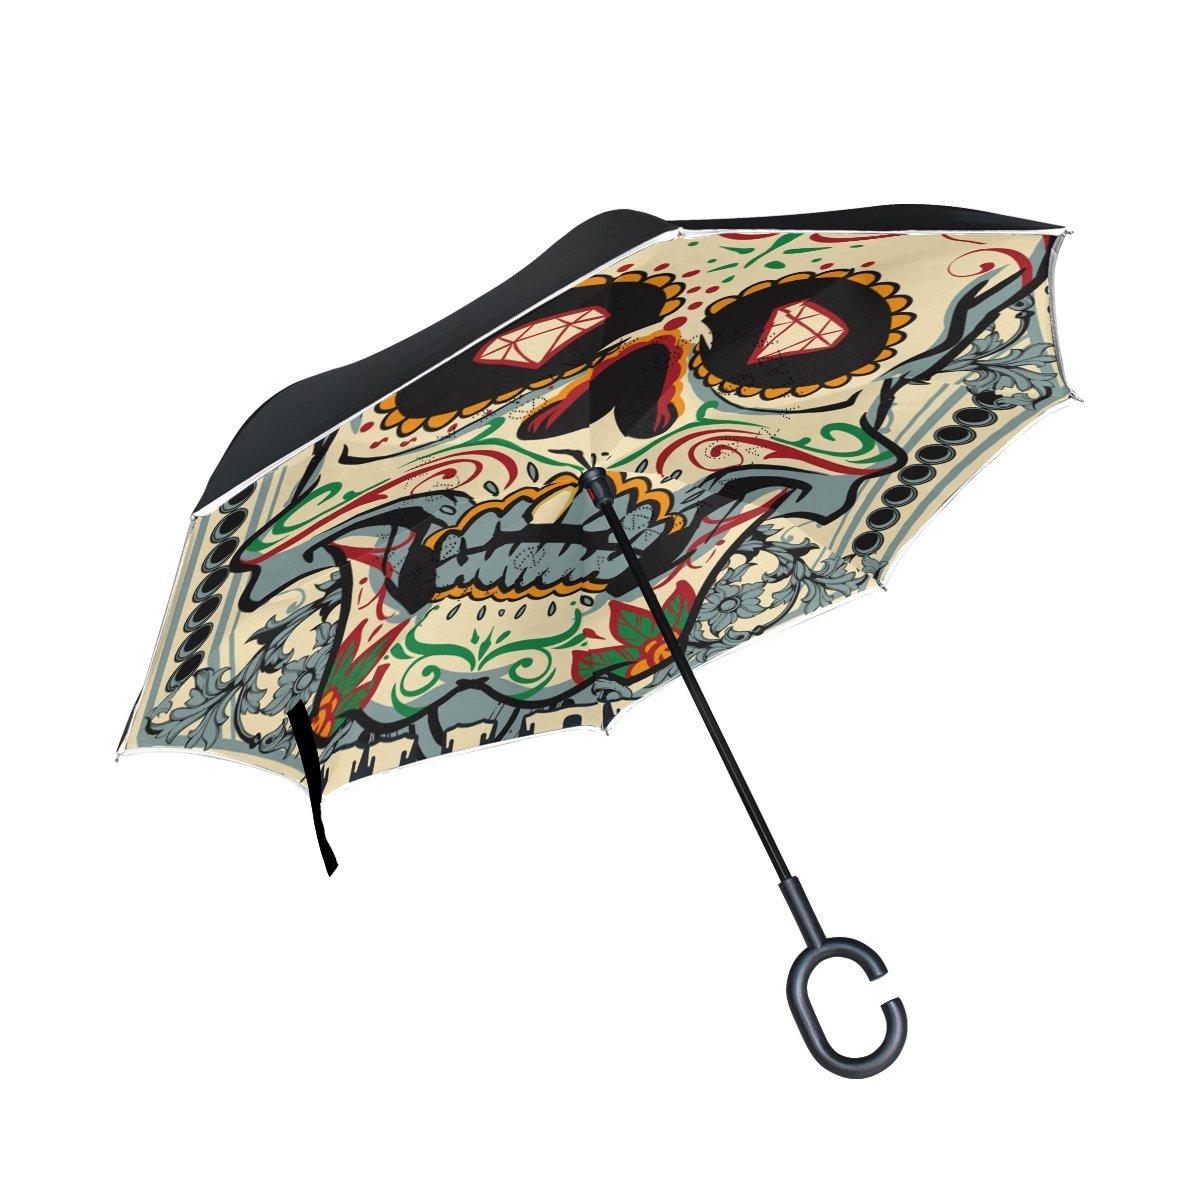 bd1789908a1d5 Sugar Skull Dia De Los Muertos Inverted Umbrella Double Layer Windproof,  Waterproof Auto Open Reverse